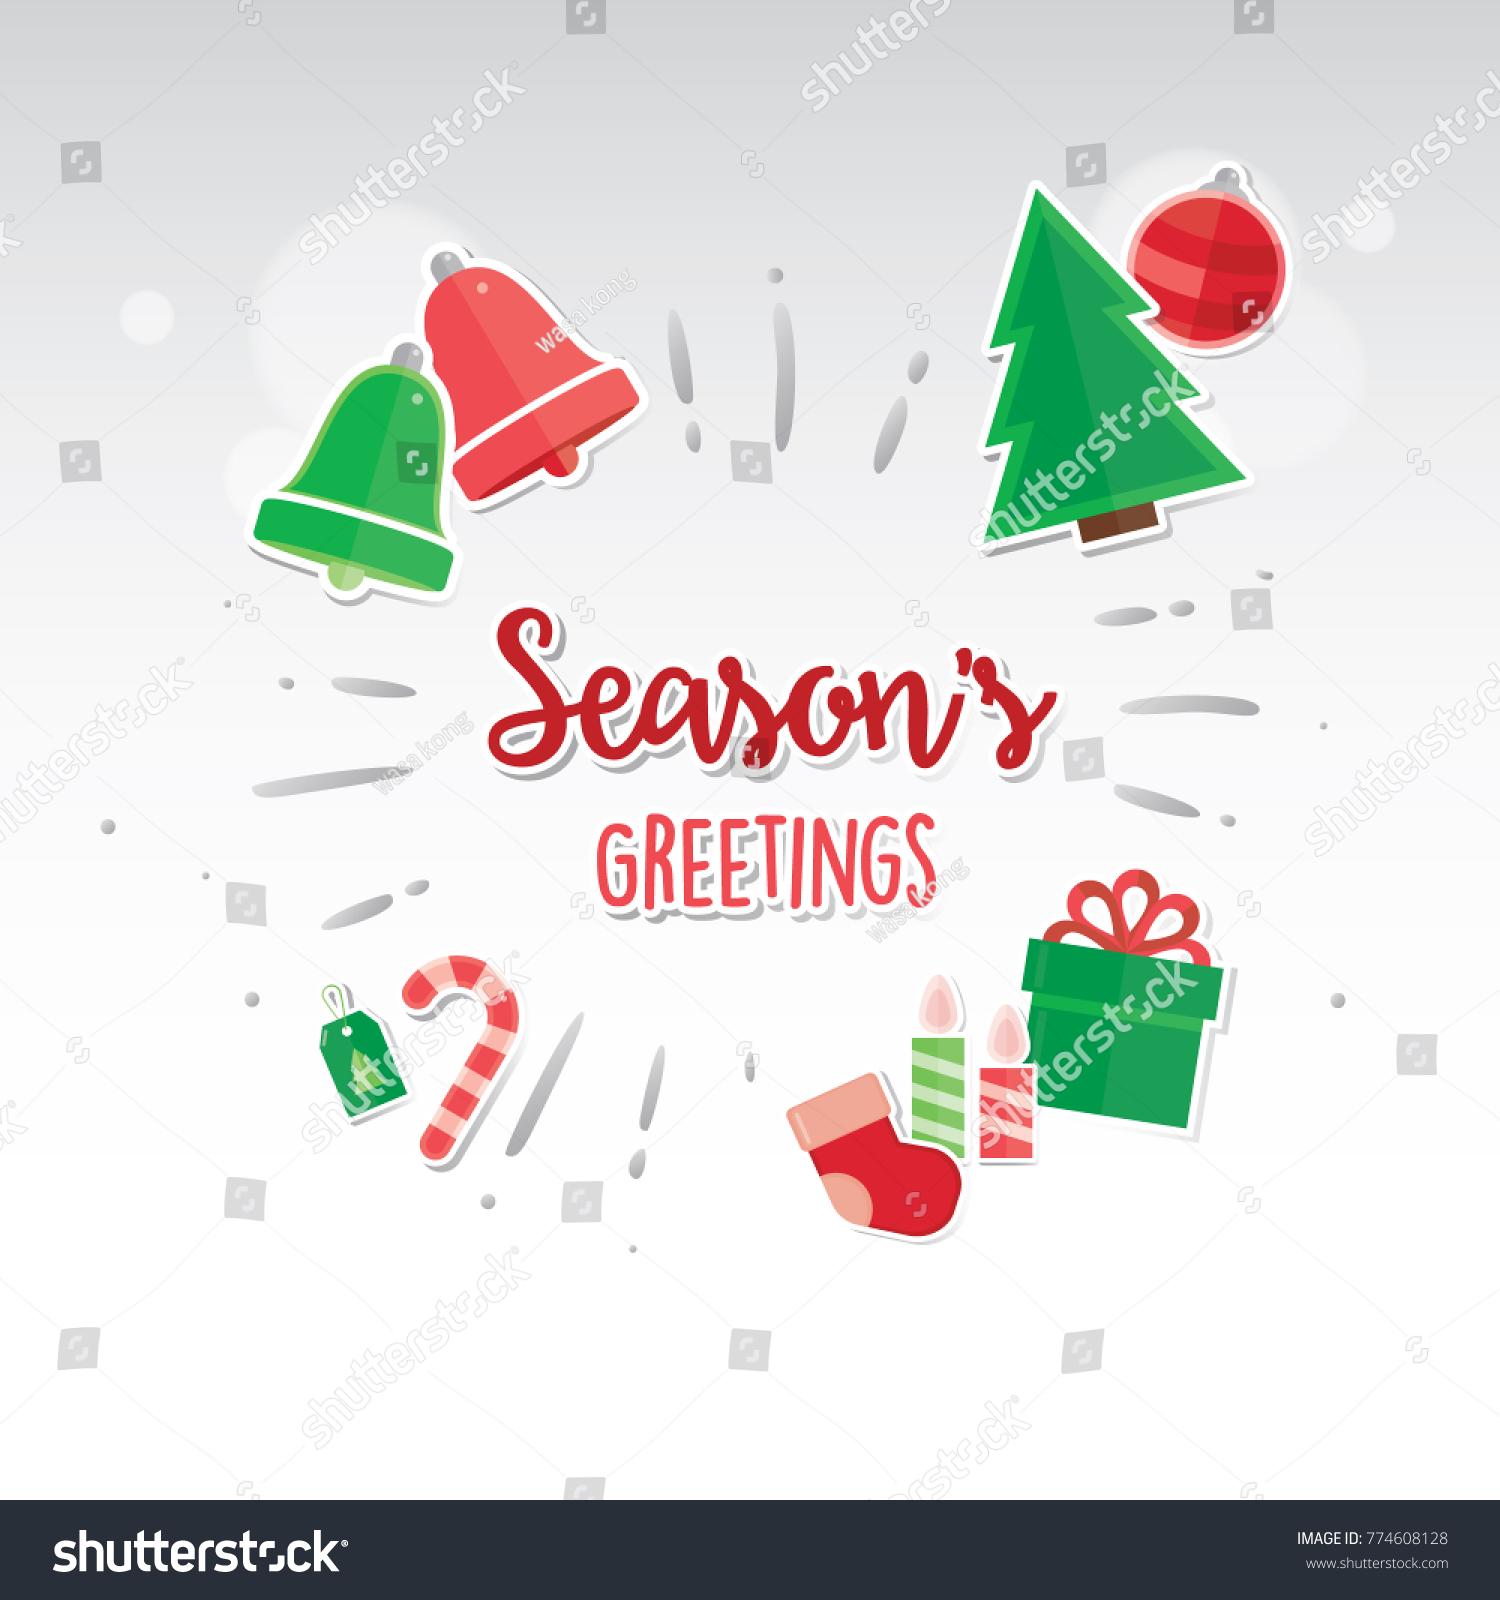 Merry Christmas Card Design Greeting Christmas Card Stock Vector